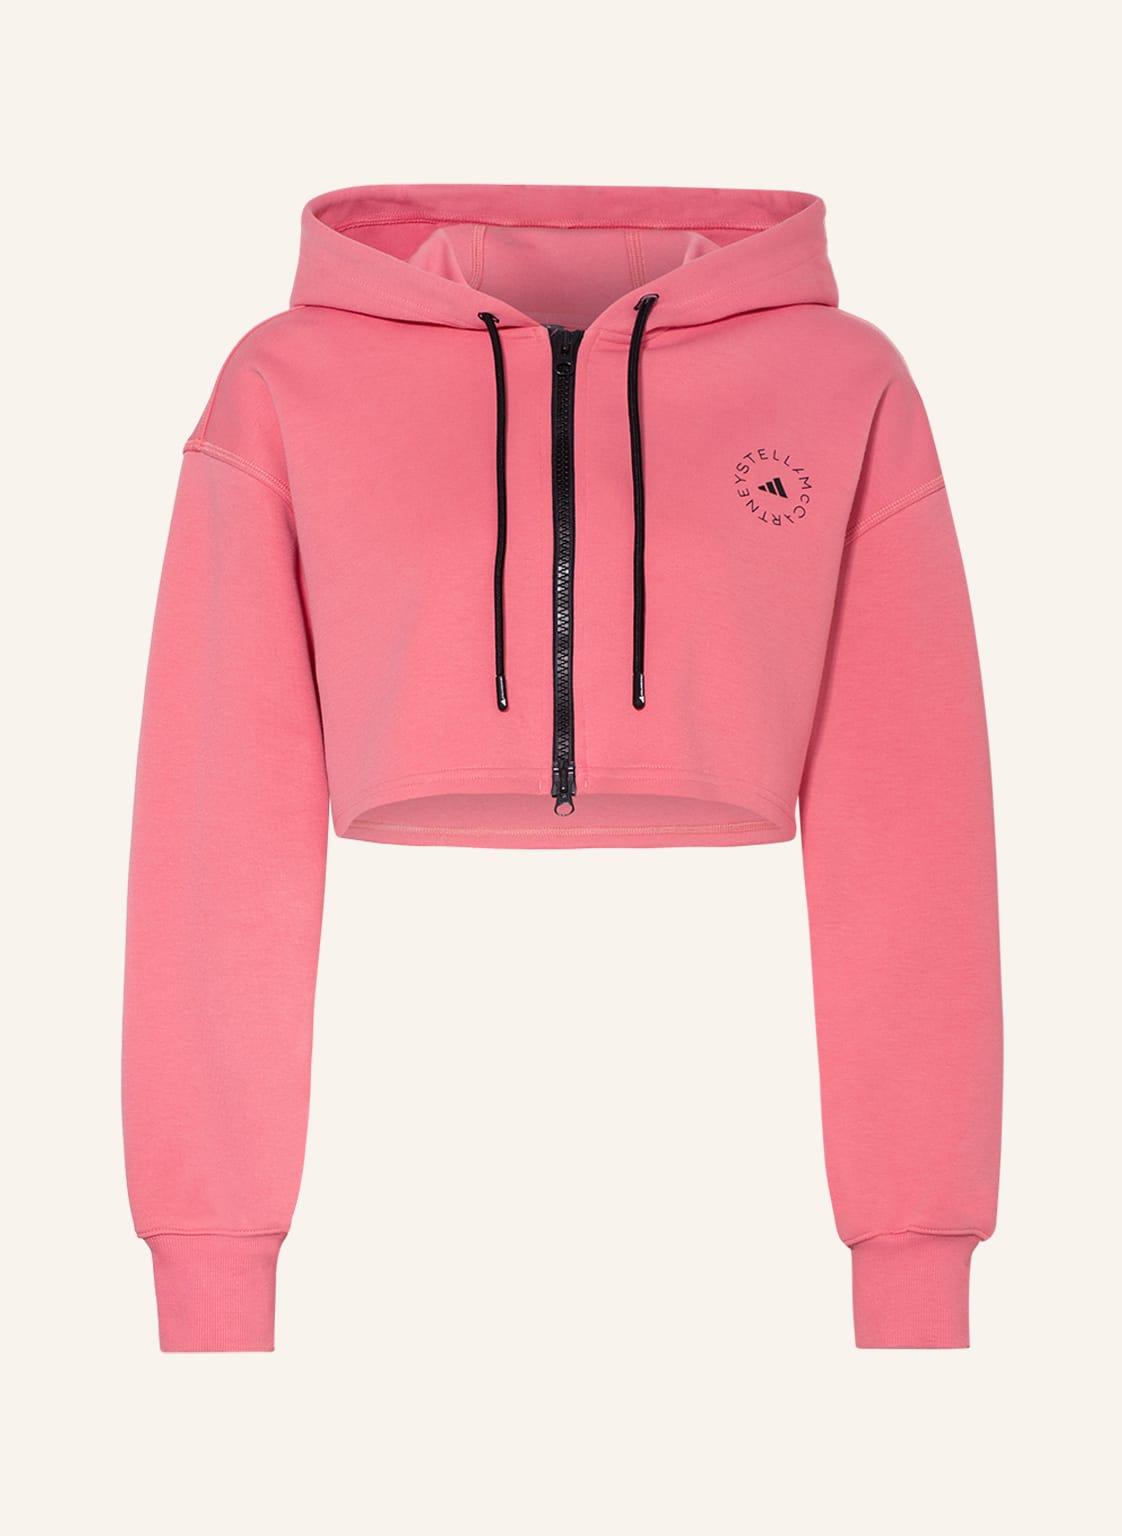 Image of Adidas By Stella Mccartney Cropped-Sweatjacke rosa